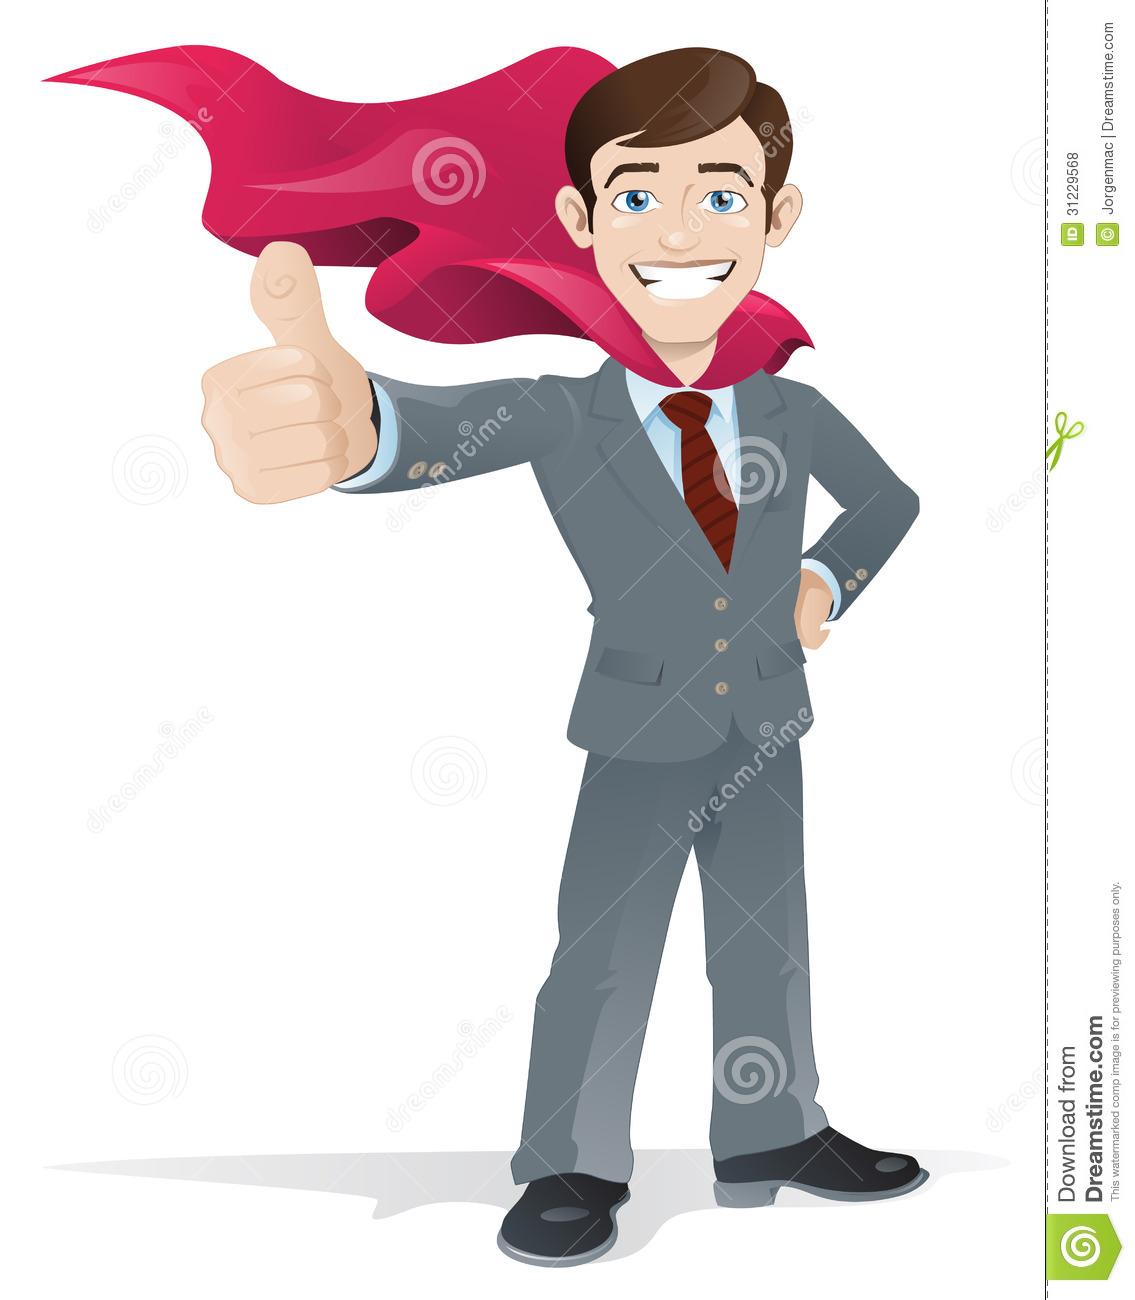 Superhero thumbs up clipart clipart transparent stock Superhero Businessman Gives The Thumbs Up Royalty Free Stock ... clipart transparent stock